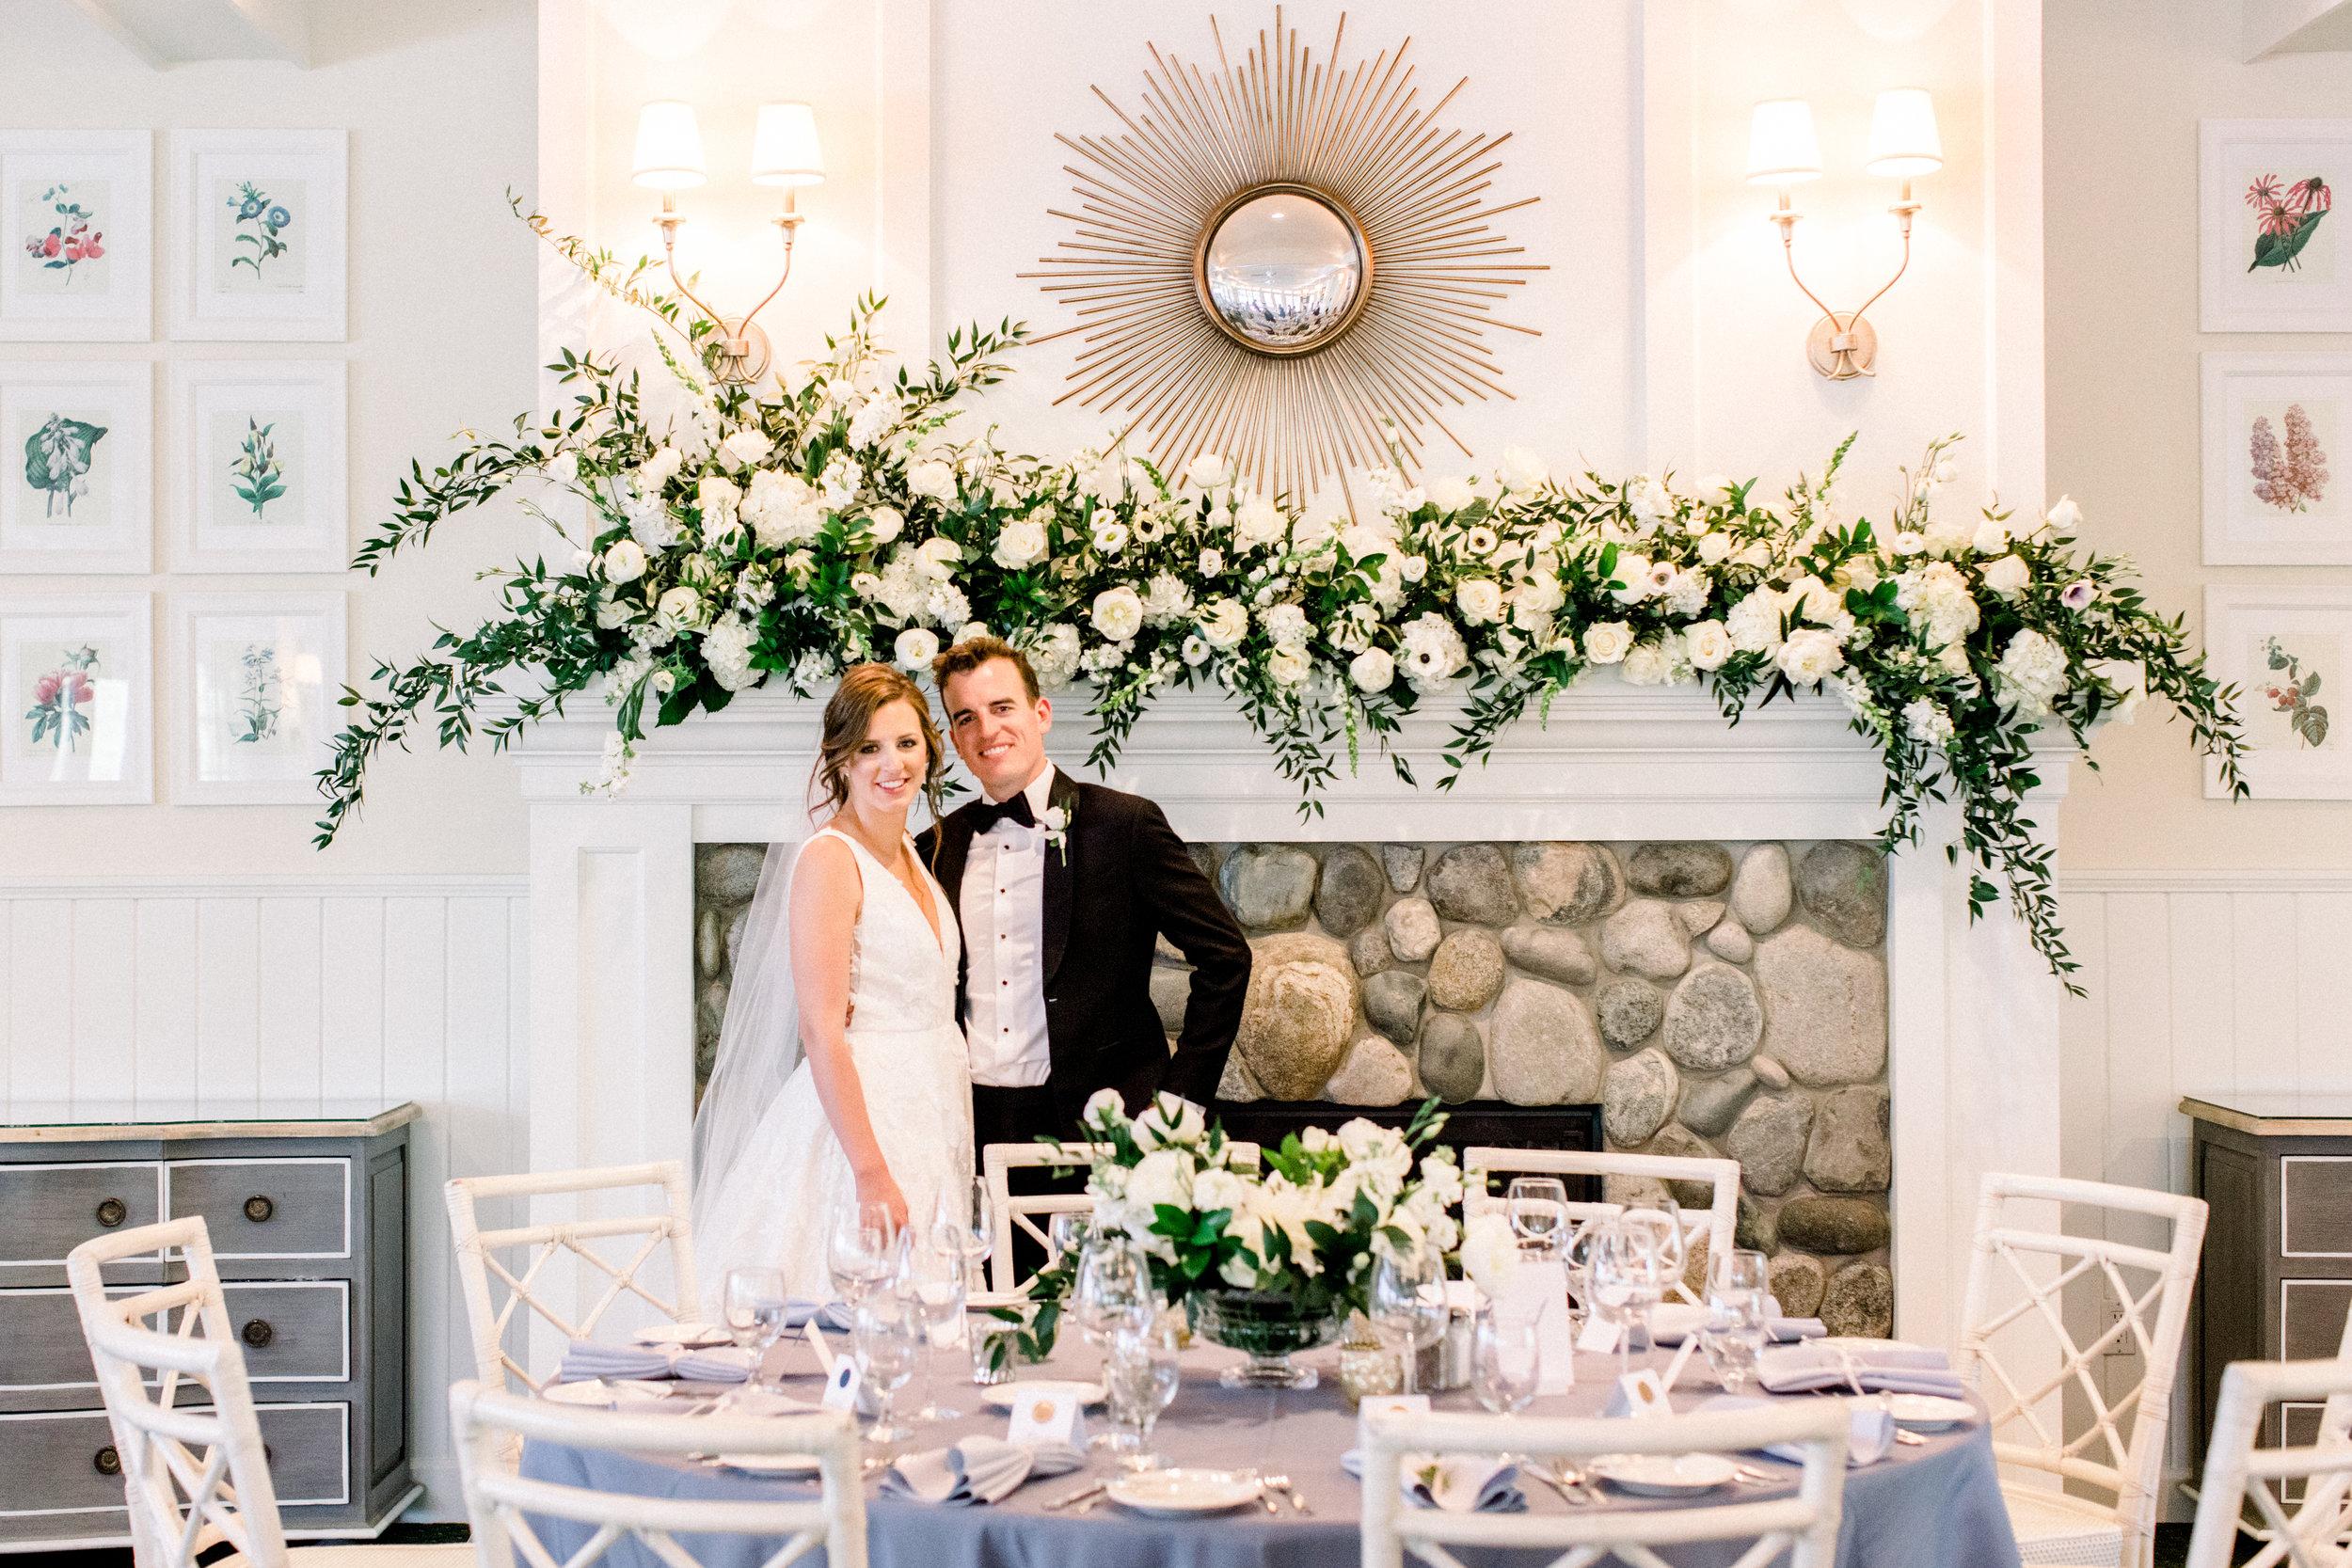 DeGuilio+Wedding+Receptpion+Details-87.jpg